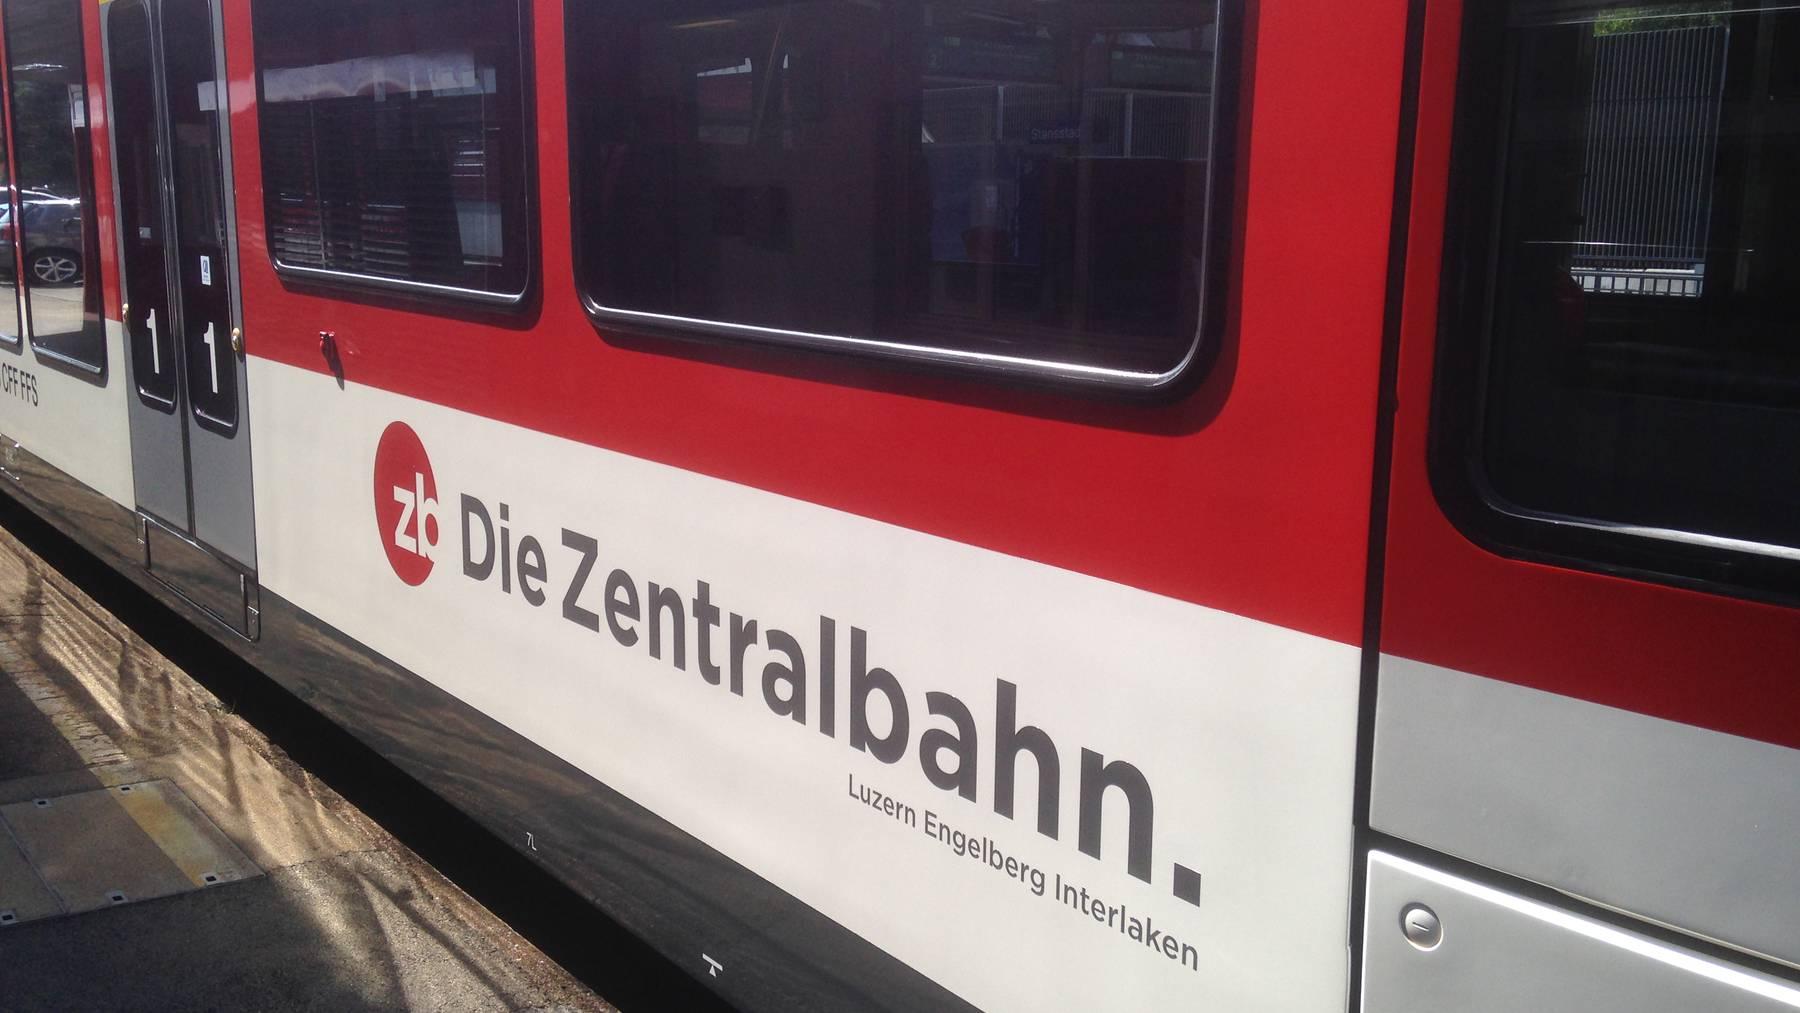 Bauarbeiten auf Zentralbahn-Strecke Hergiswil-Giswil